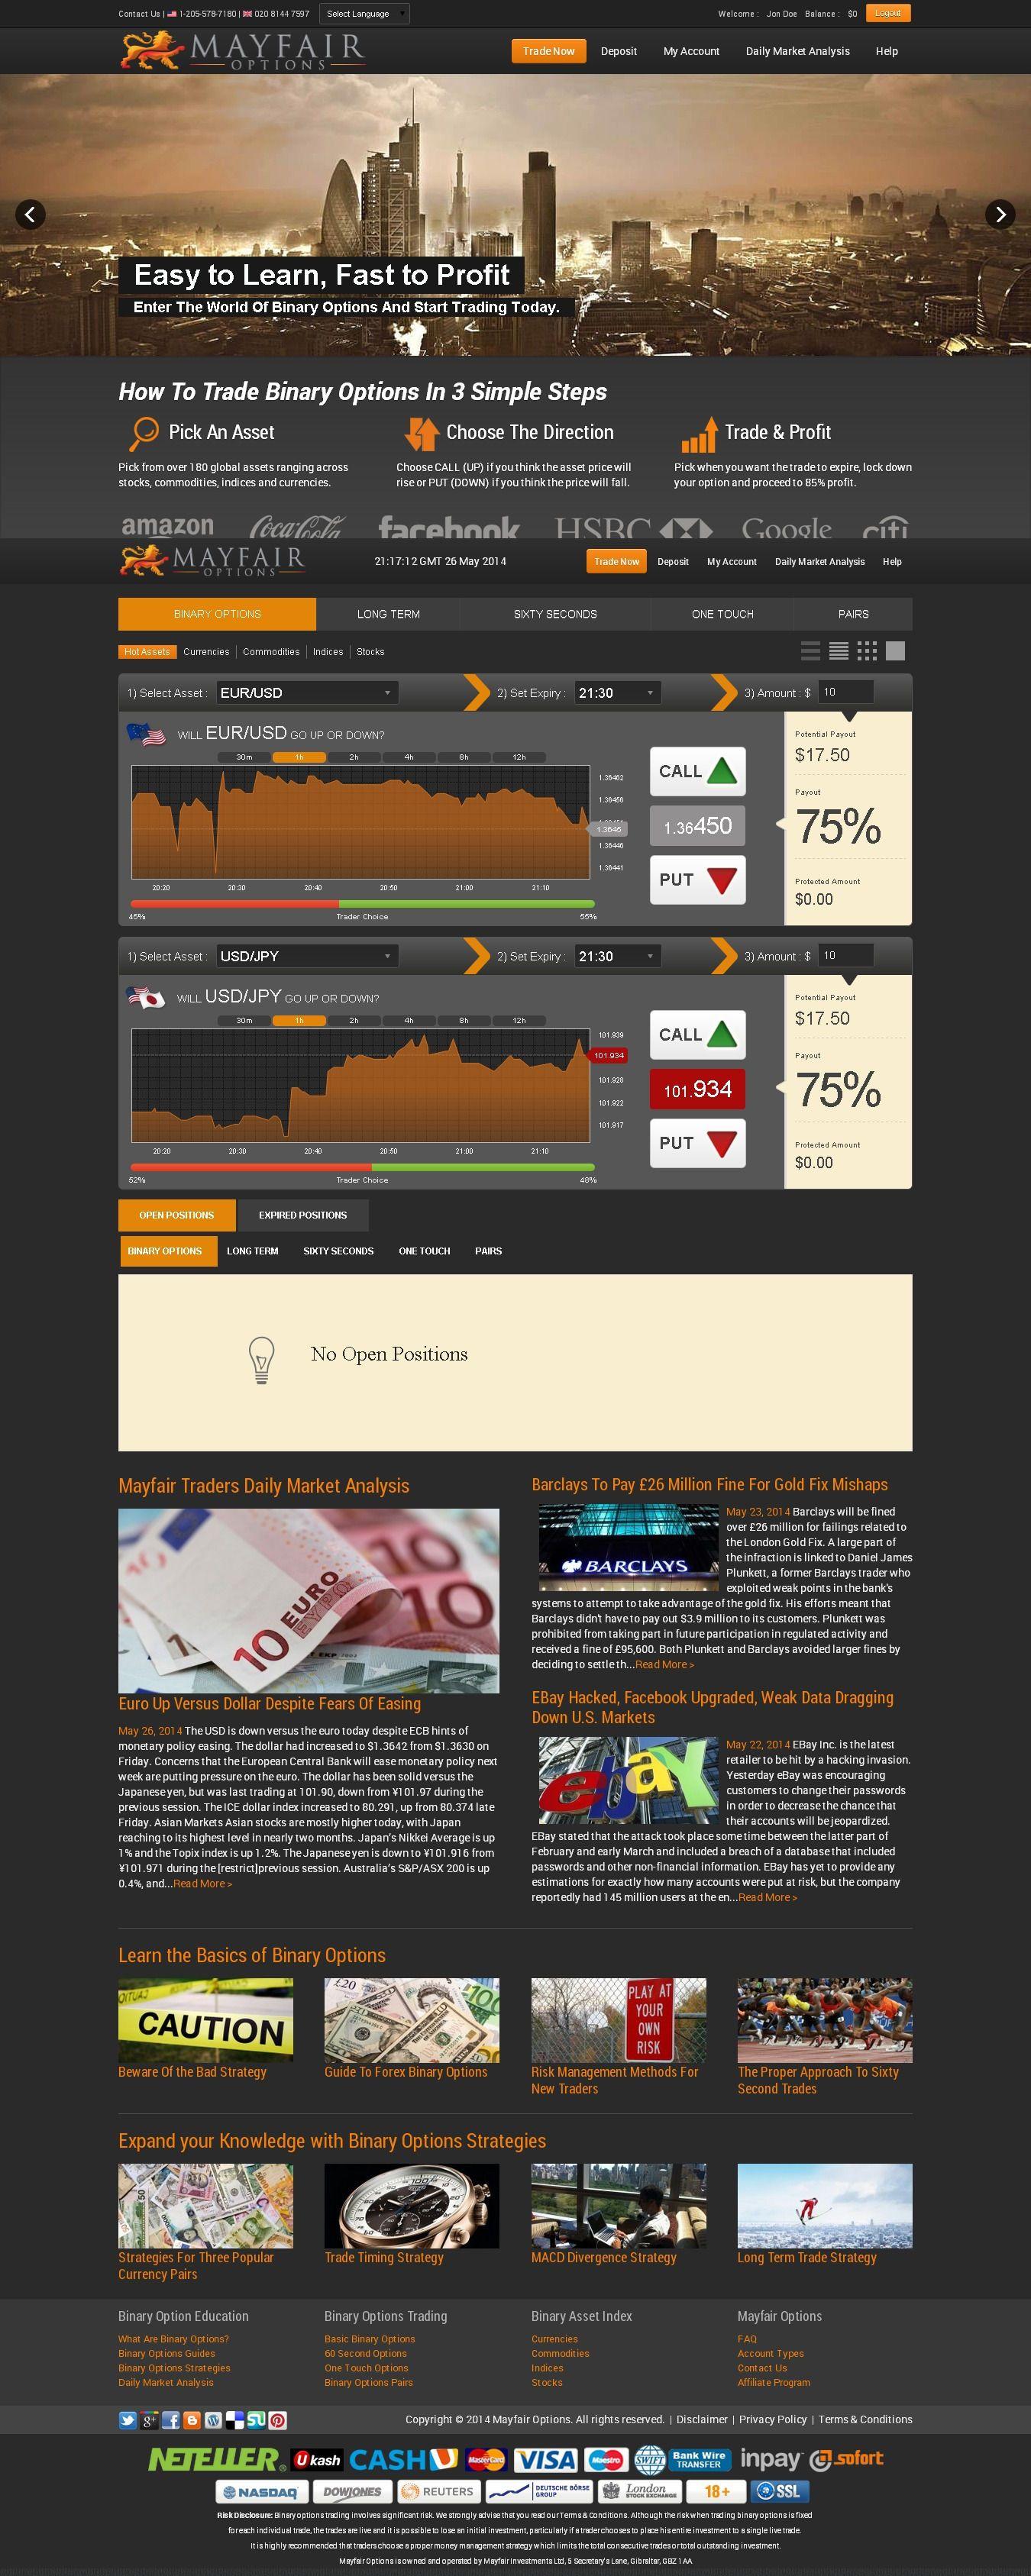 piattaforma trading demo deposito cara olymp commercio bitcoin menggunakan